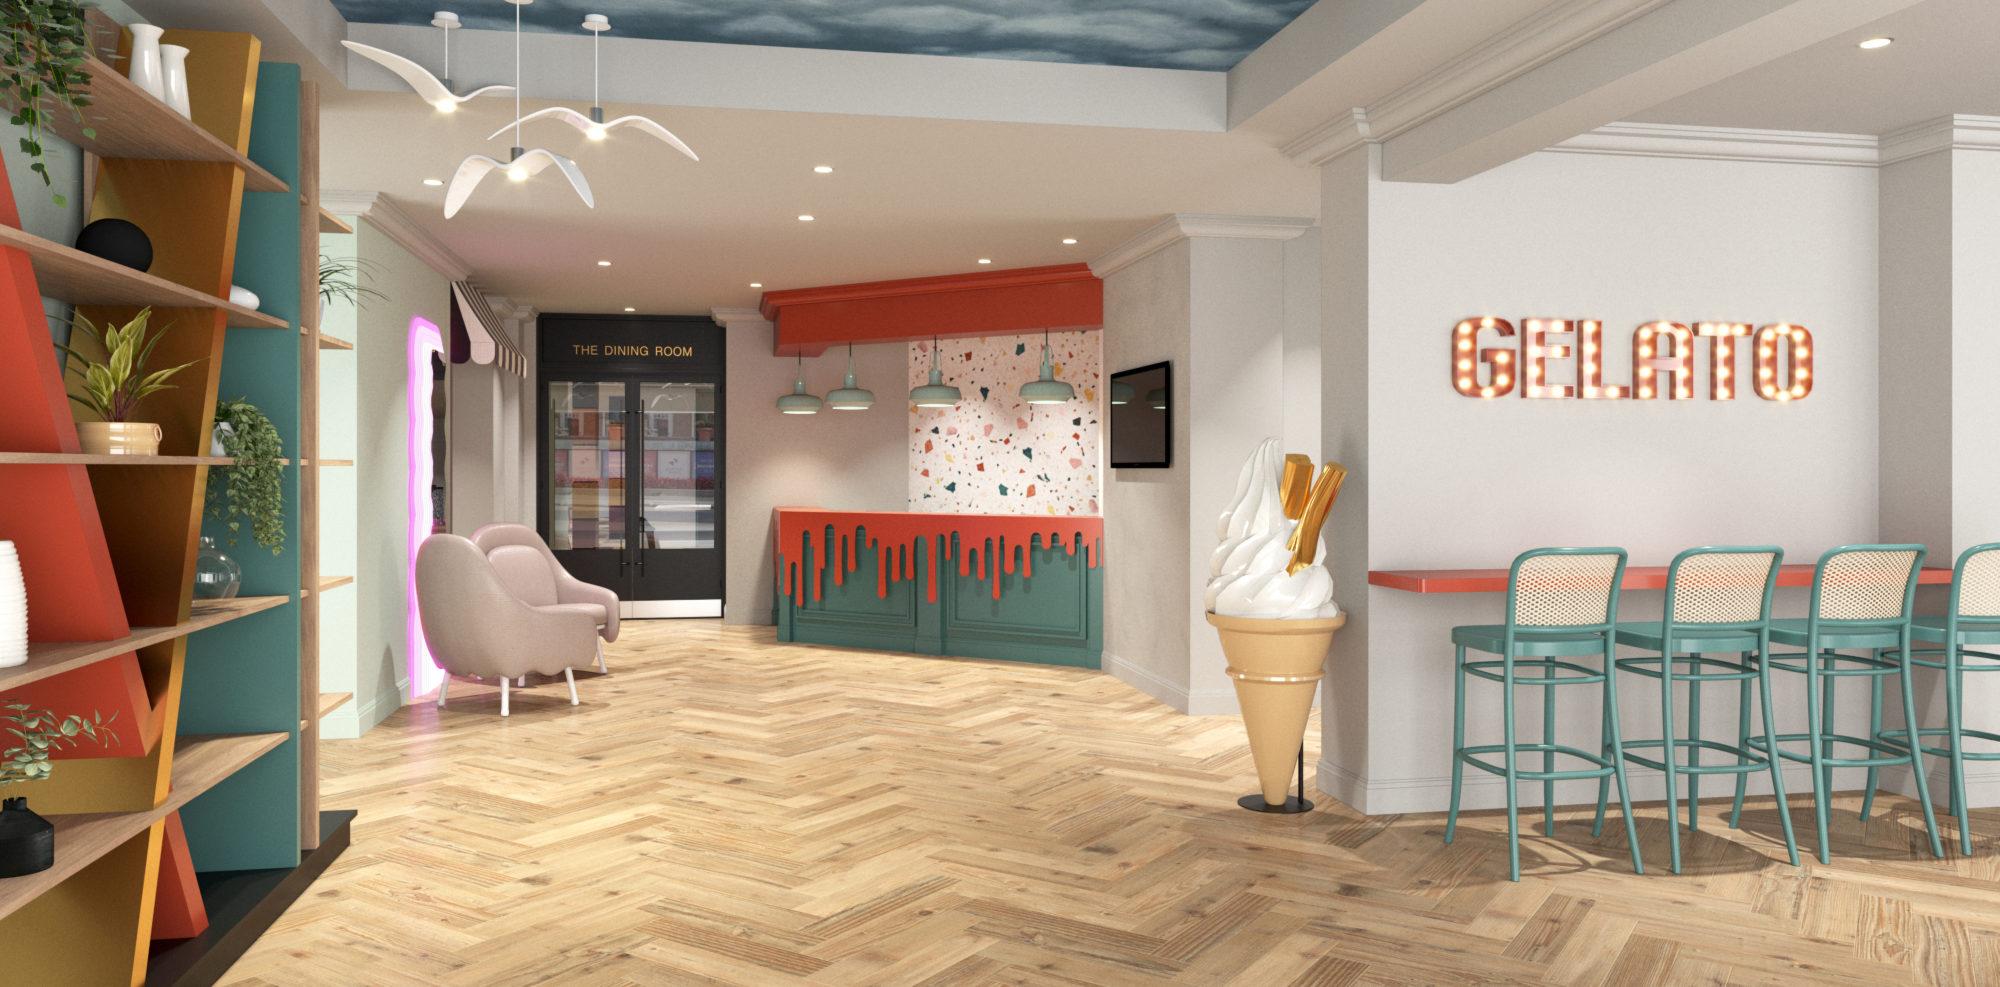 BSIBIS – Bournemouth V4C Reception 300 DPI 1-jpg